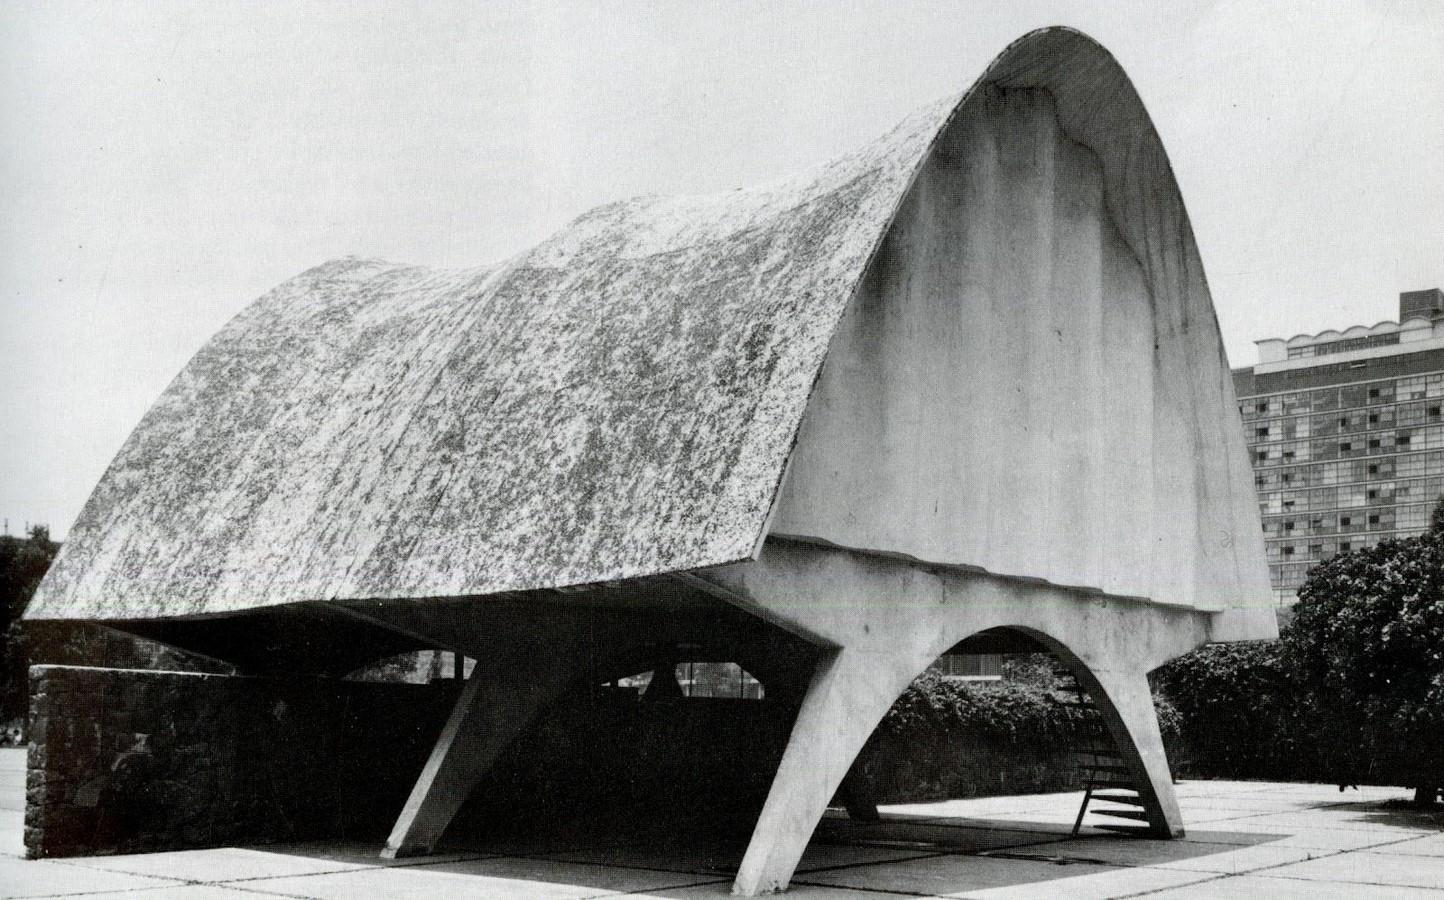 Cosmic Rays Pavilion, Mexico City, Mexico - Sheet3